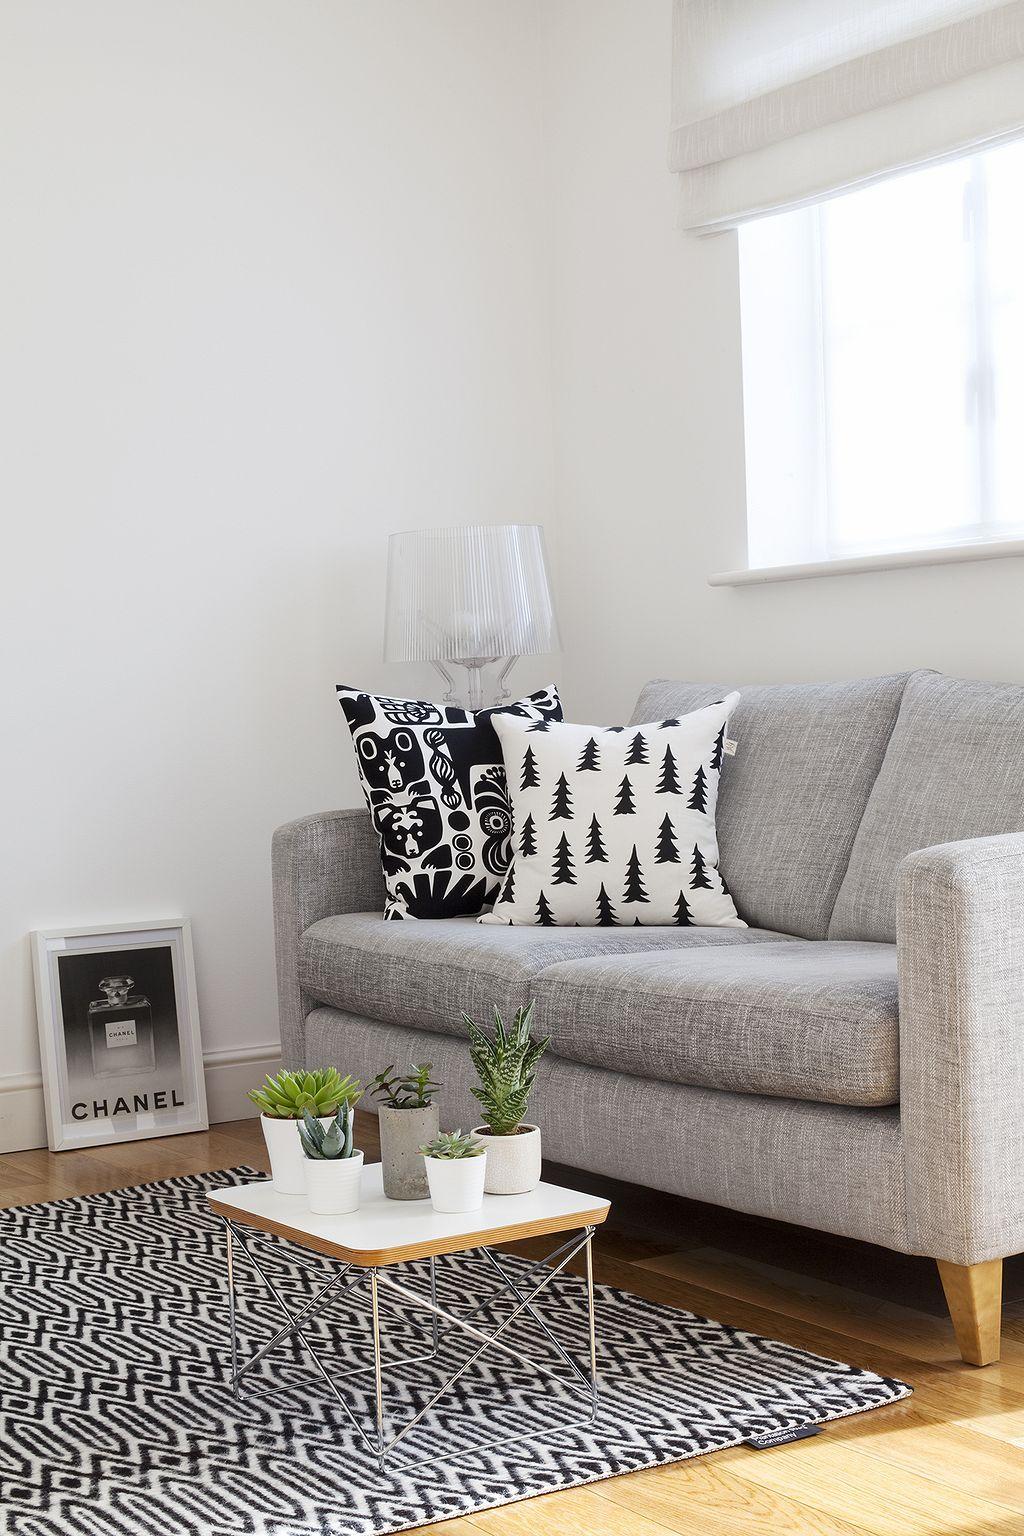 livingroom candidate the living room candidate minimalist homes